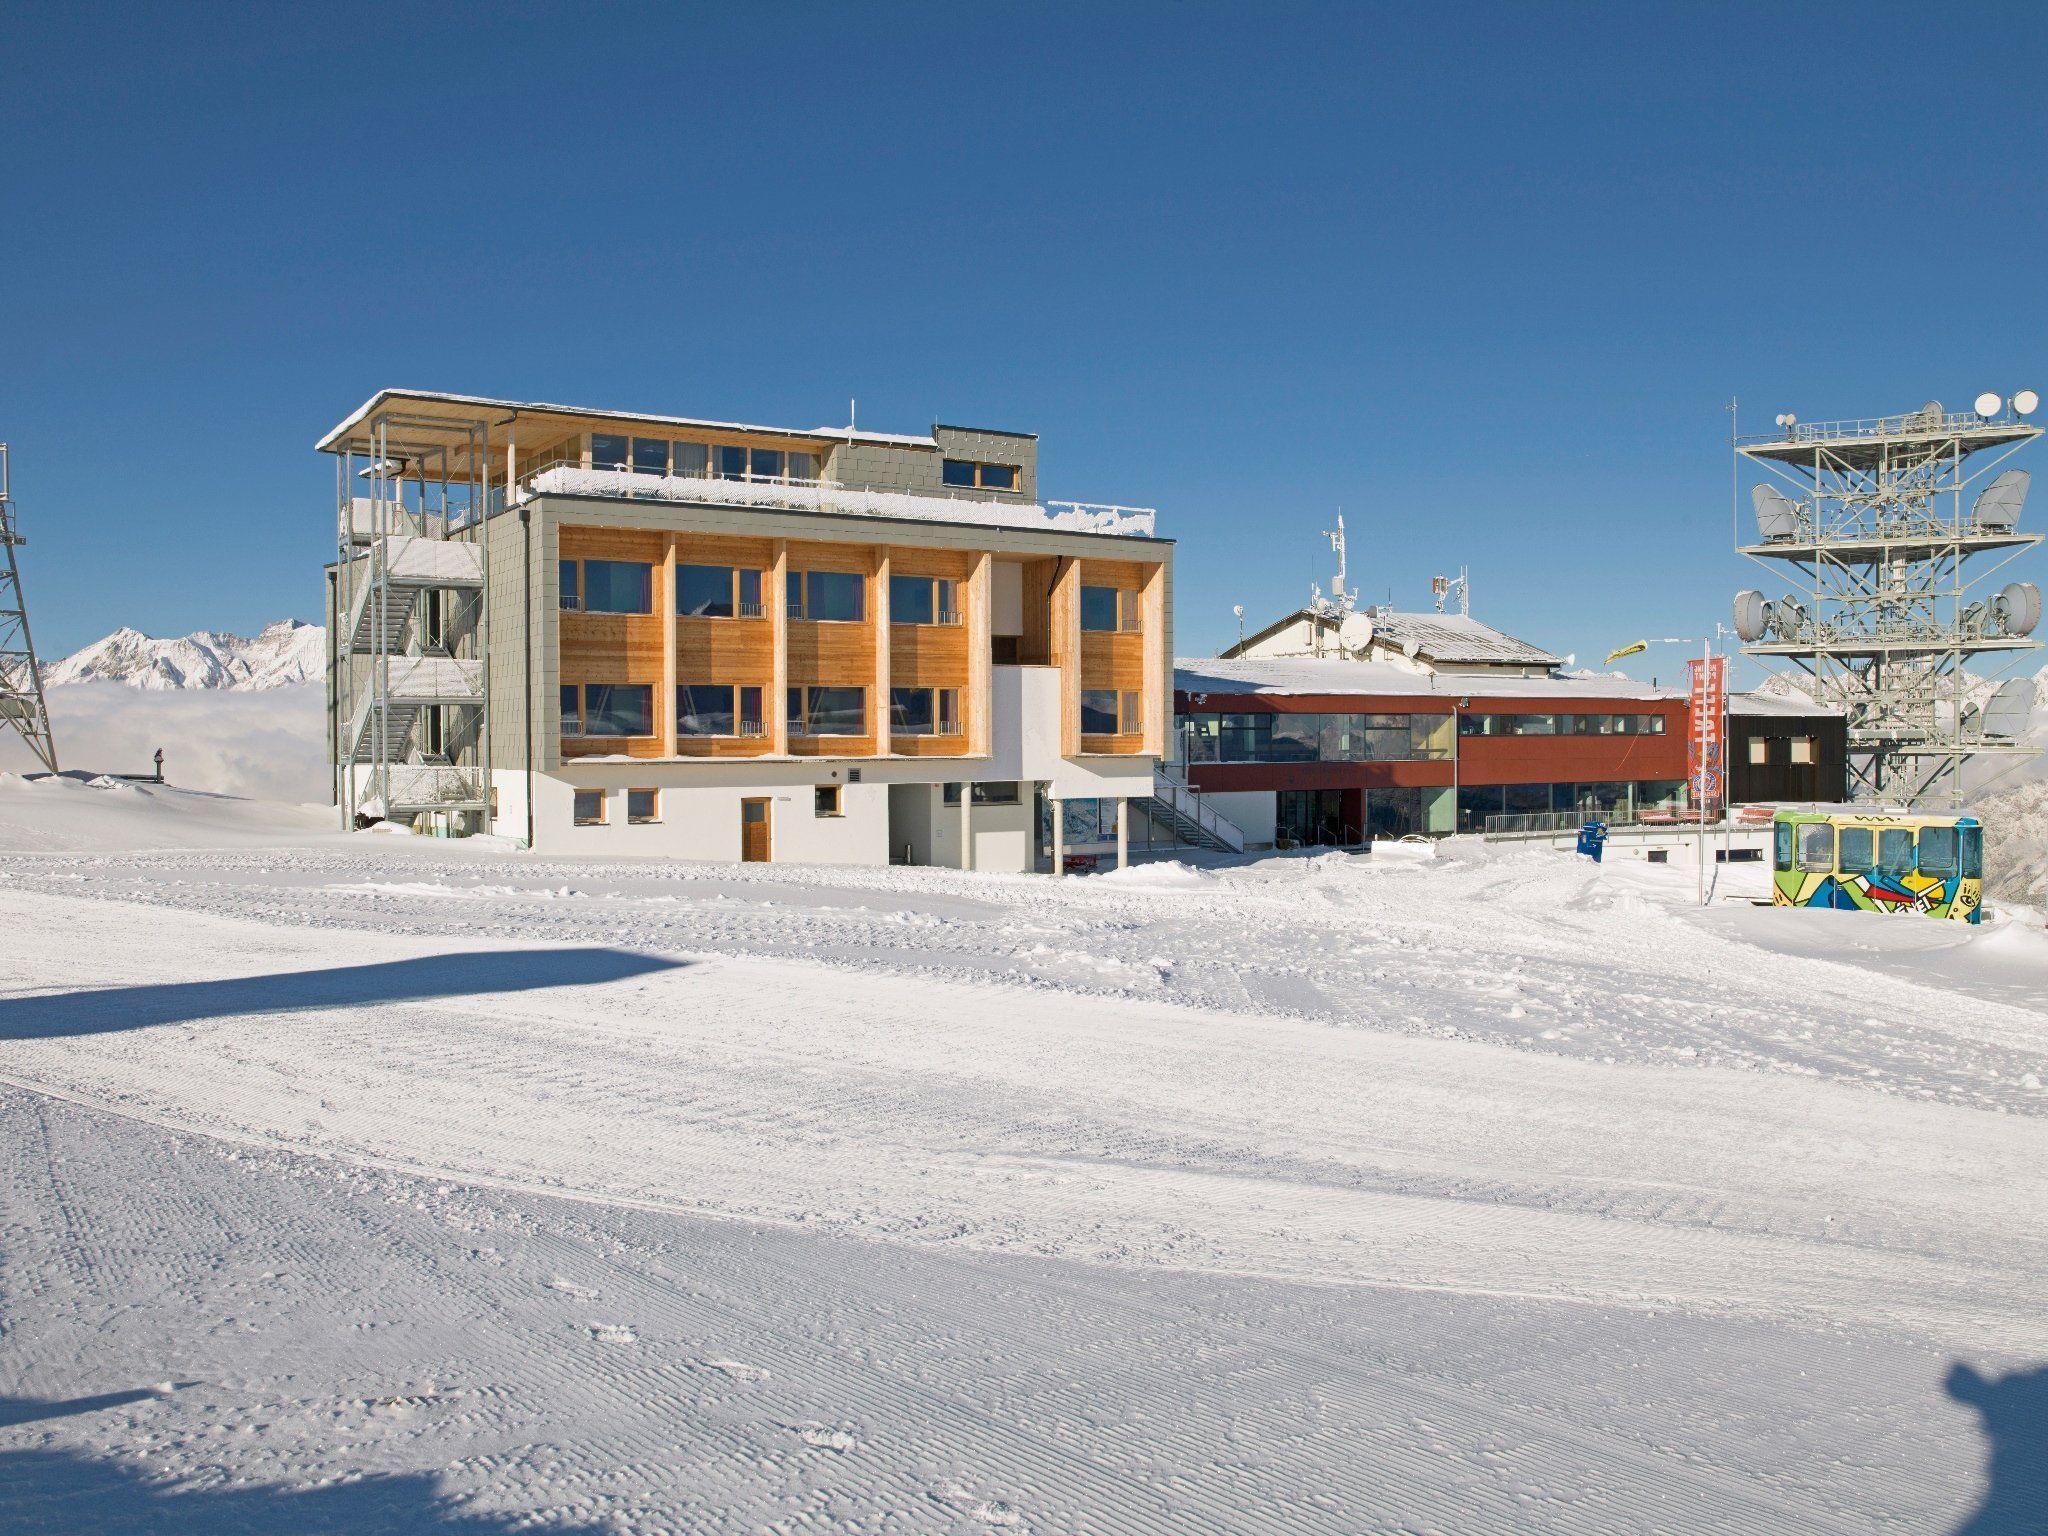 Venet Gipfelhütte